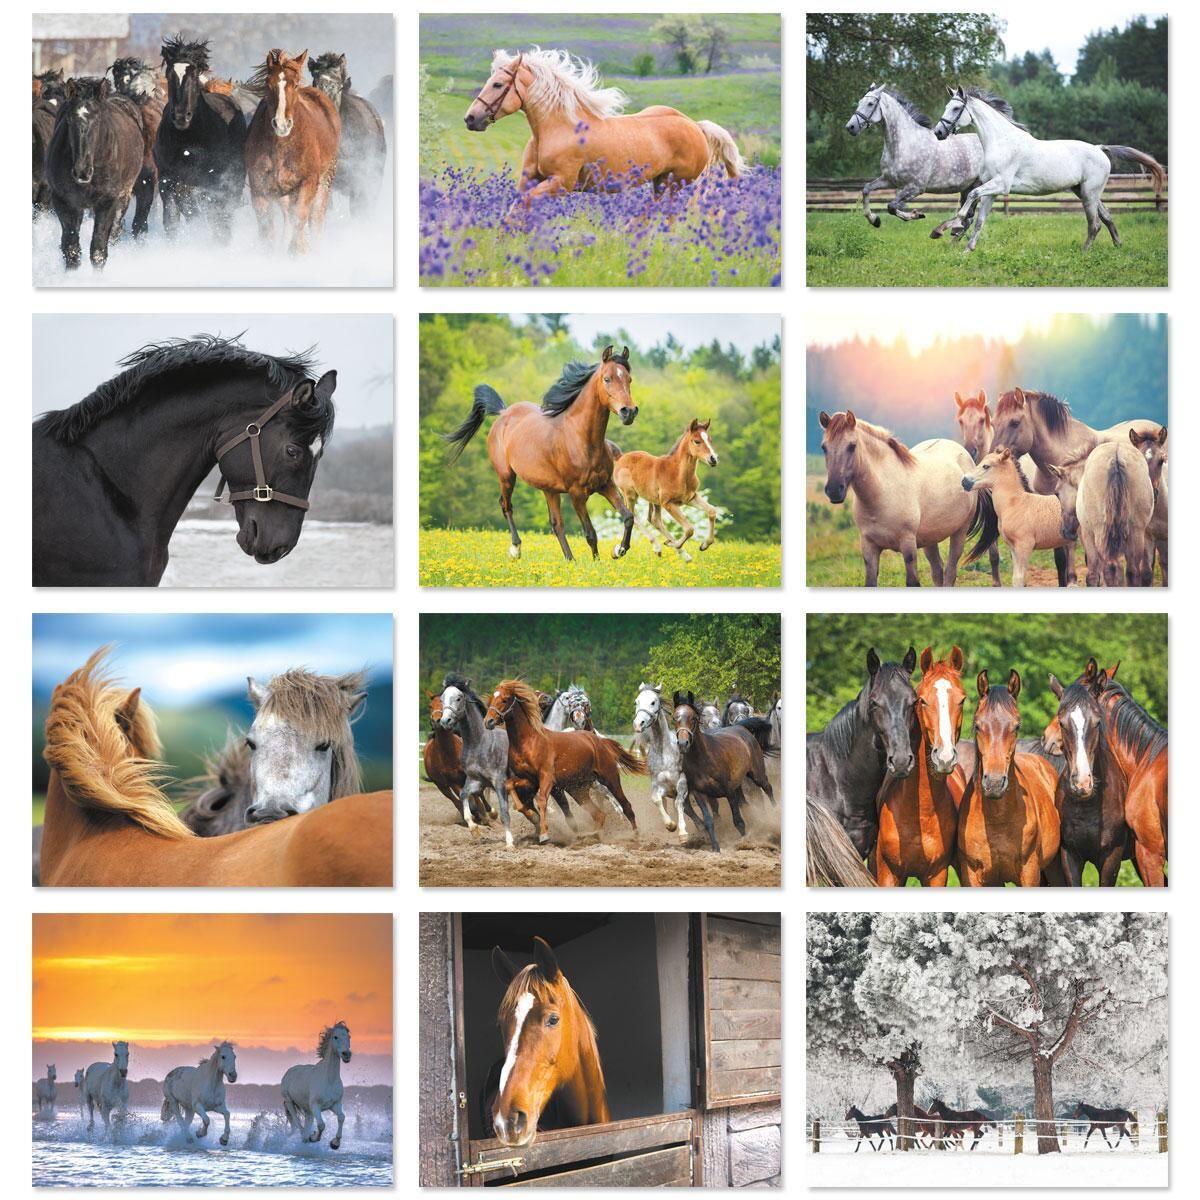 2018 Horses Wall Calendar